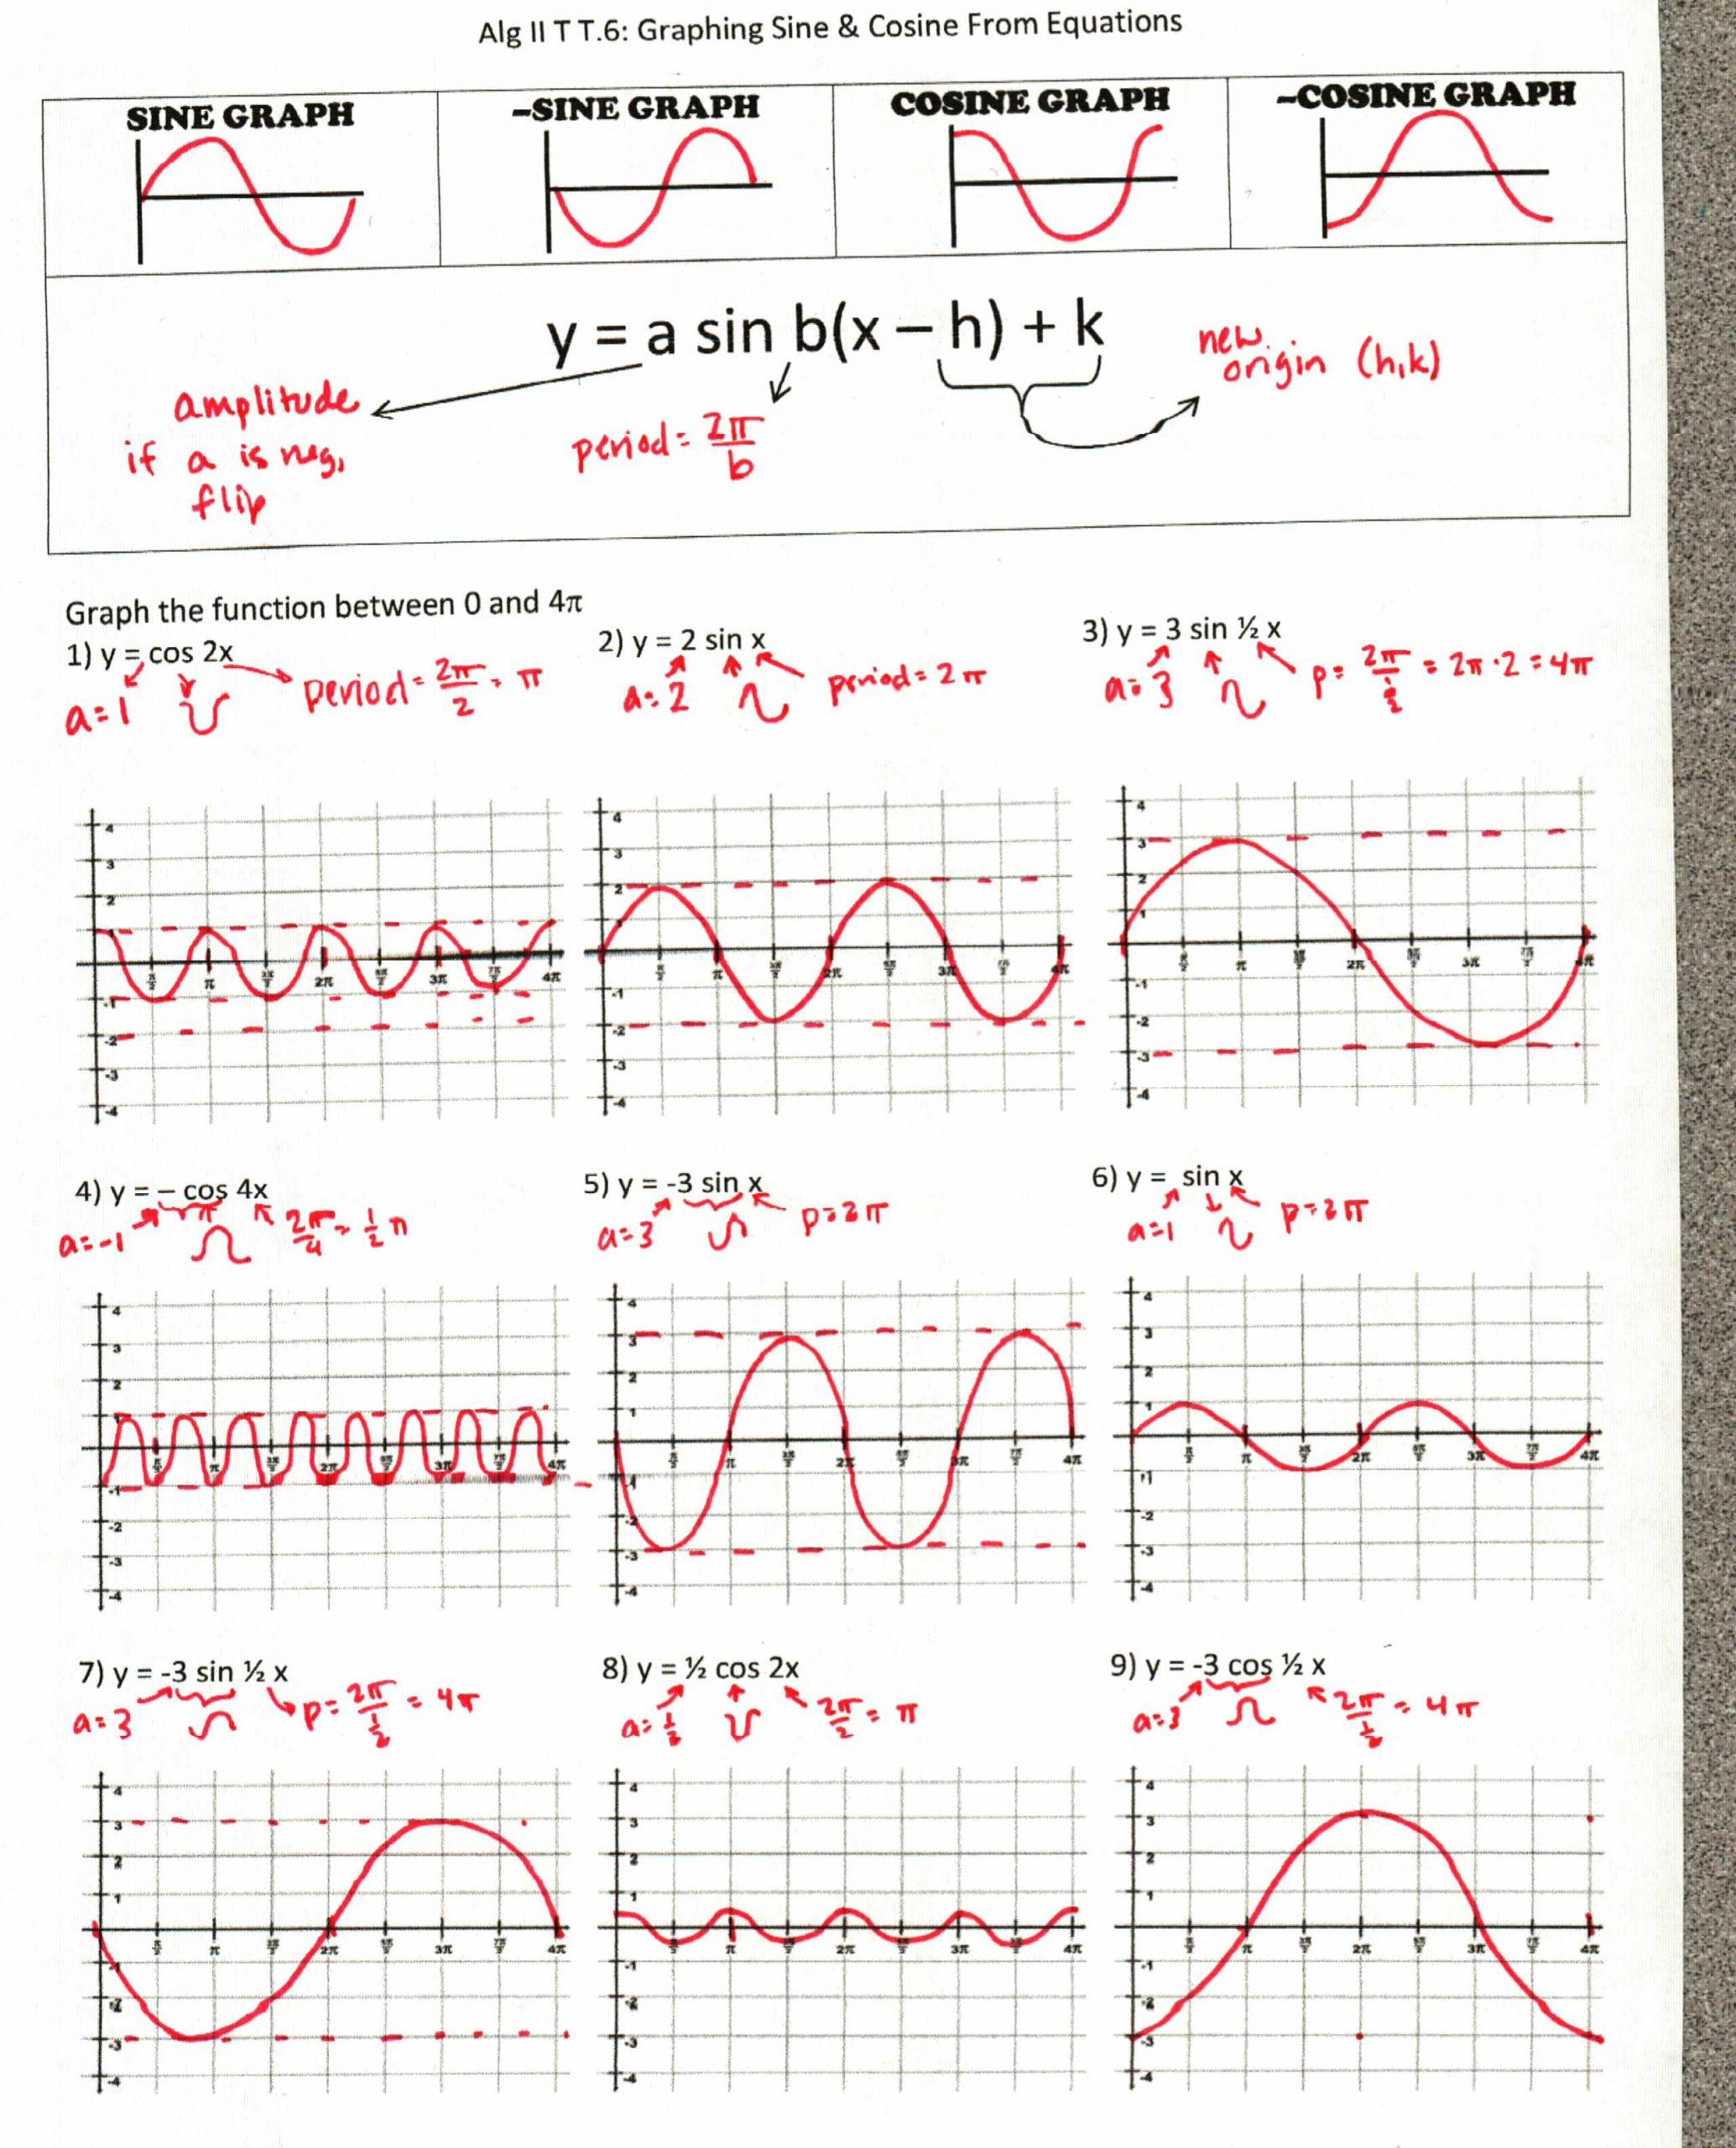 Graphing Trig Functions Practice Worksheet 30 Graphing Trig Functions Practice Worksheet with Answers